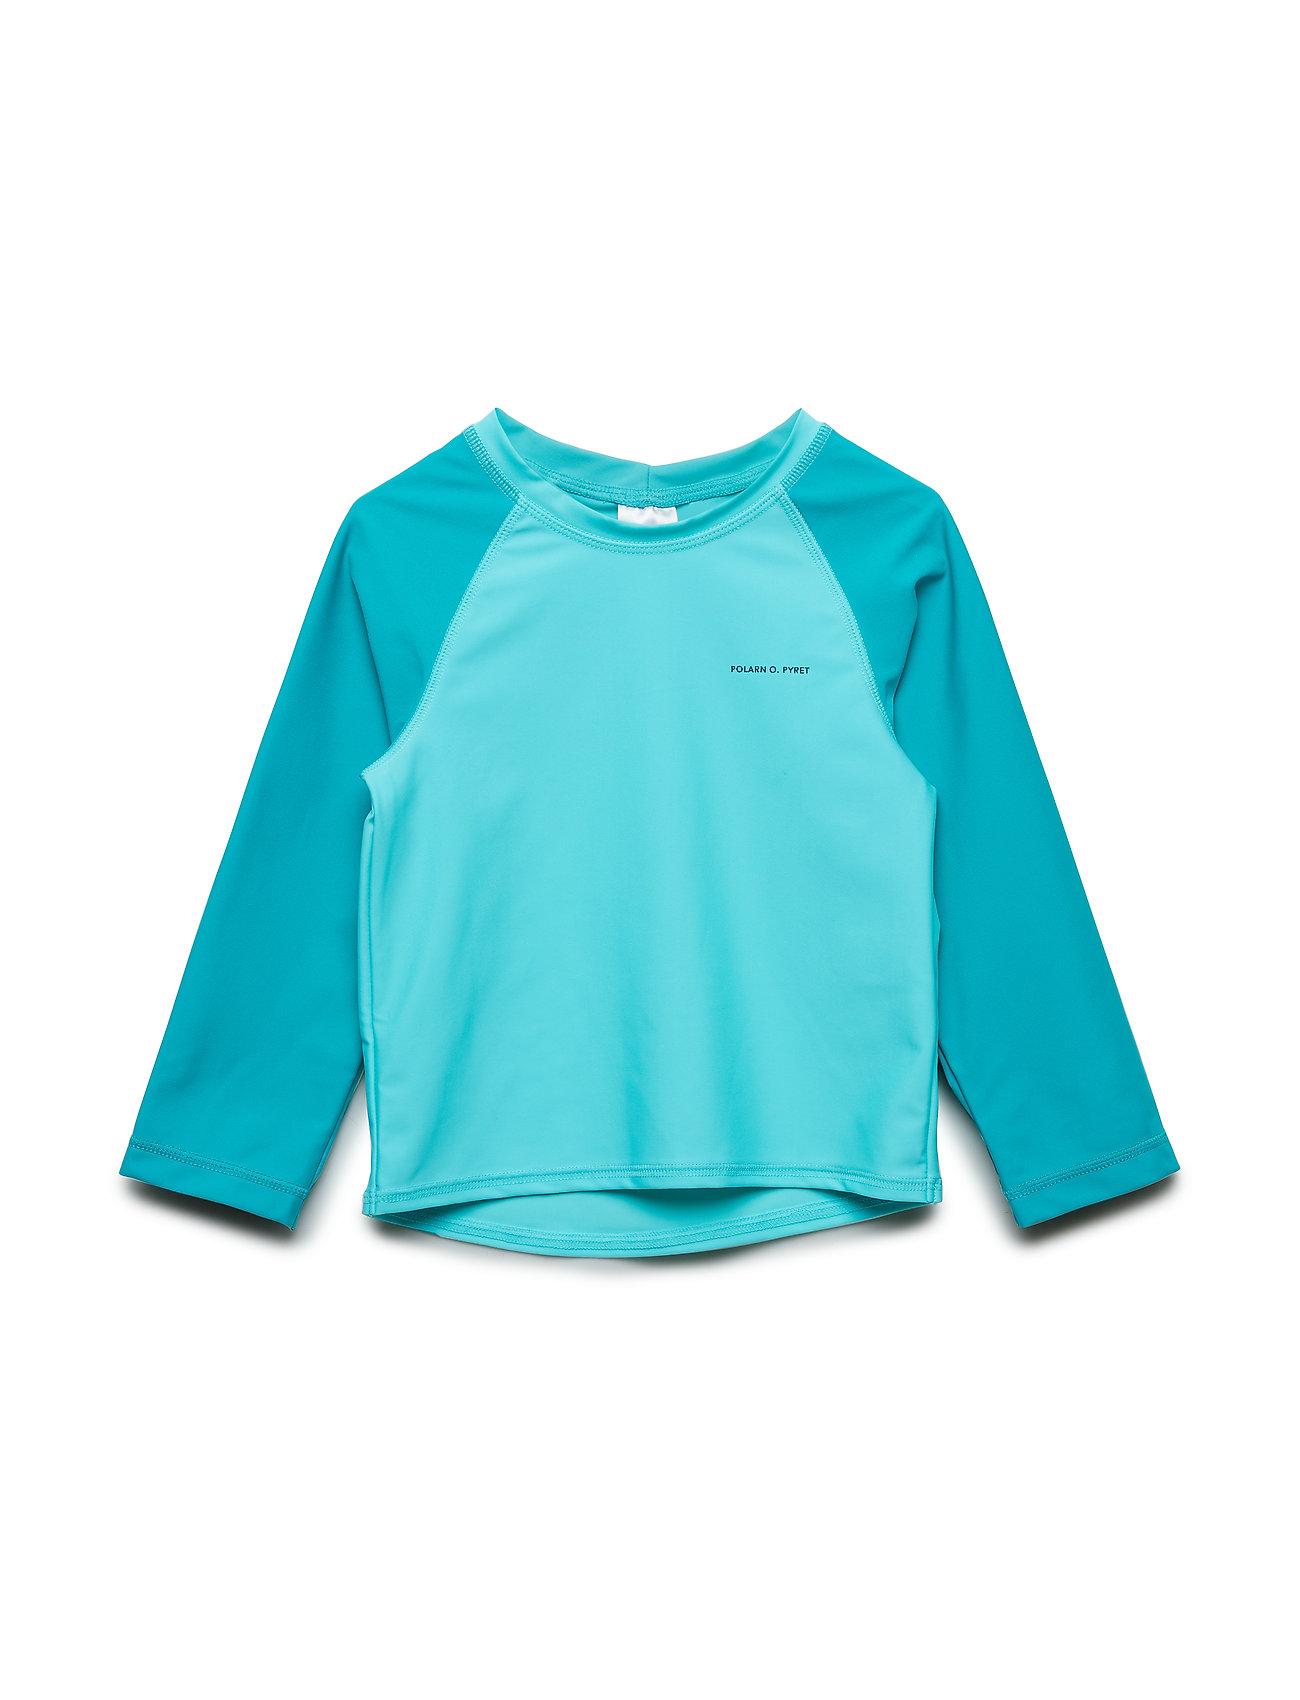 Polarn O. Pyret Swimwear Top l/s UPF Preschool